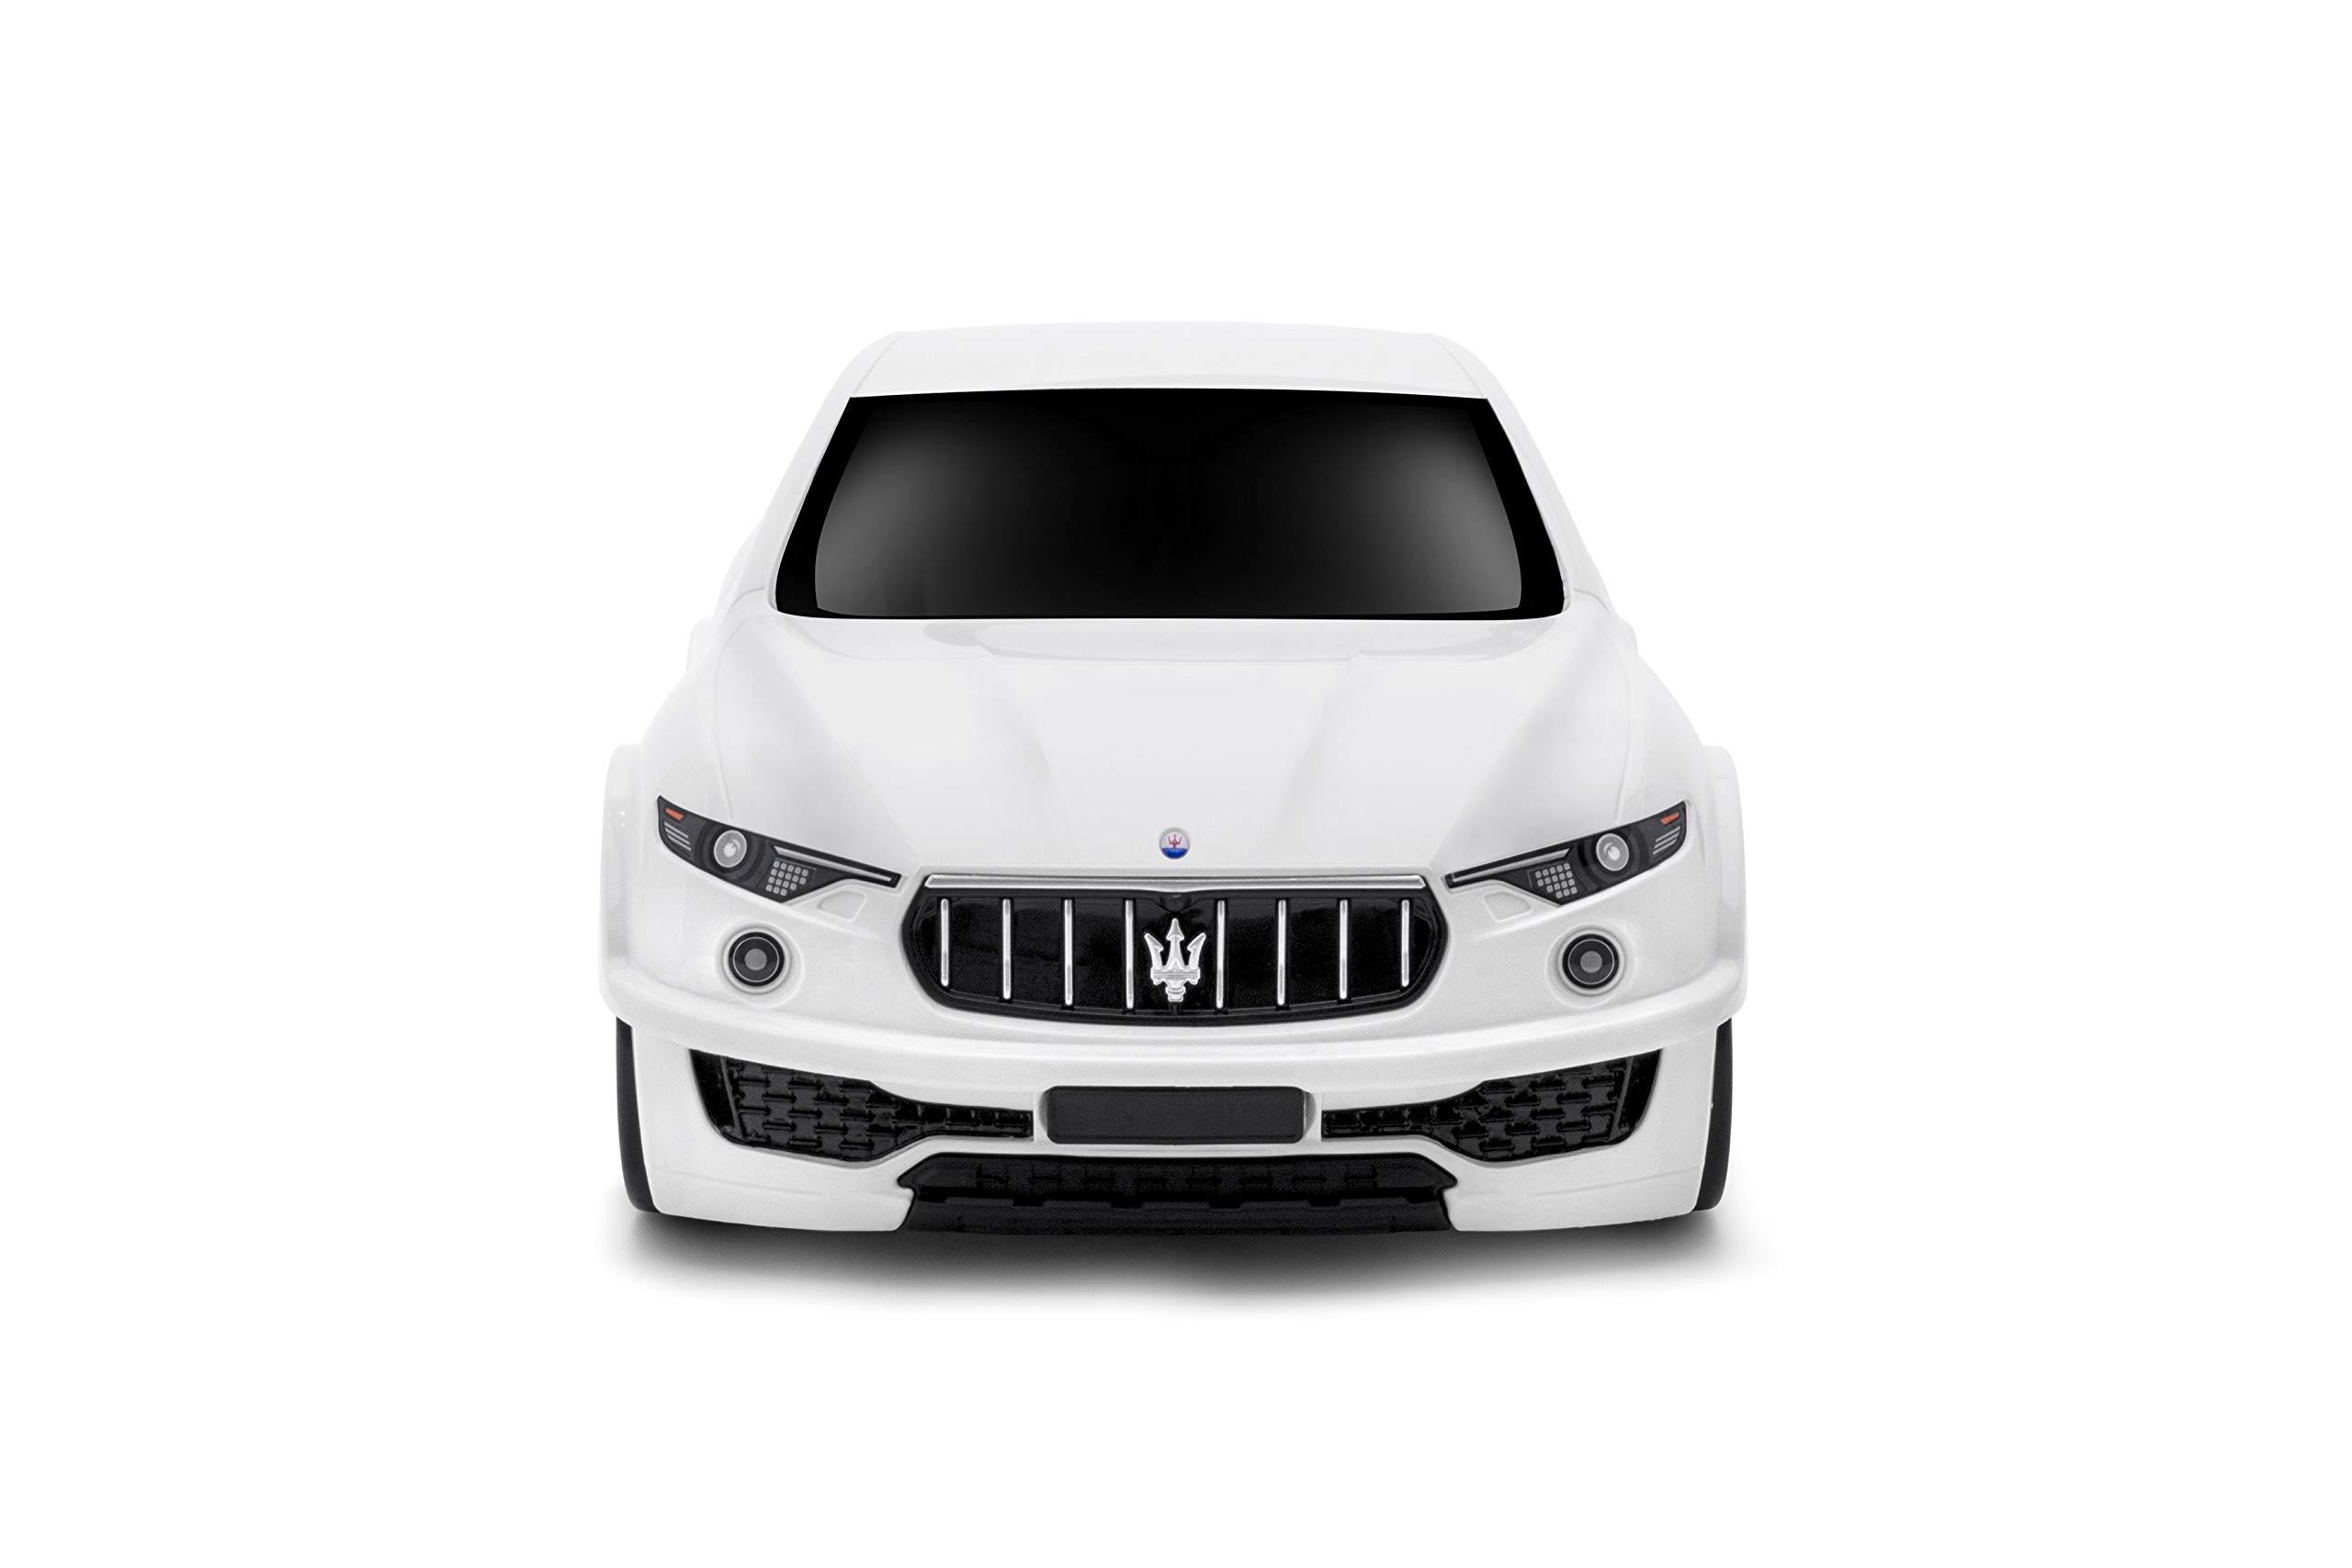 Ridaz Maserati Levante Carry-on Hand Luggage for kids, White Maserati Levante